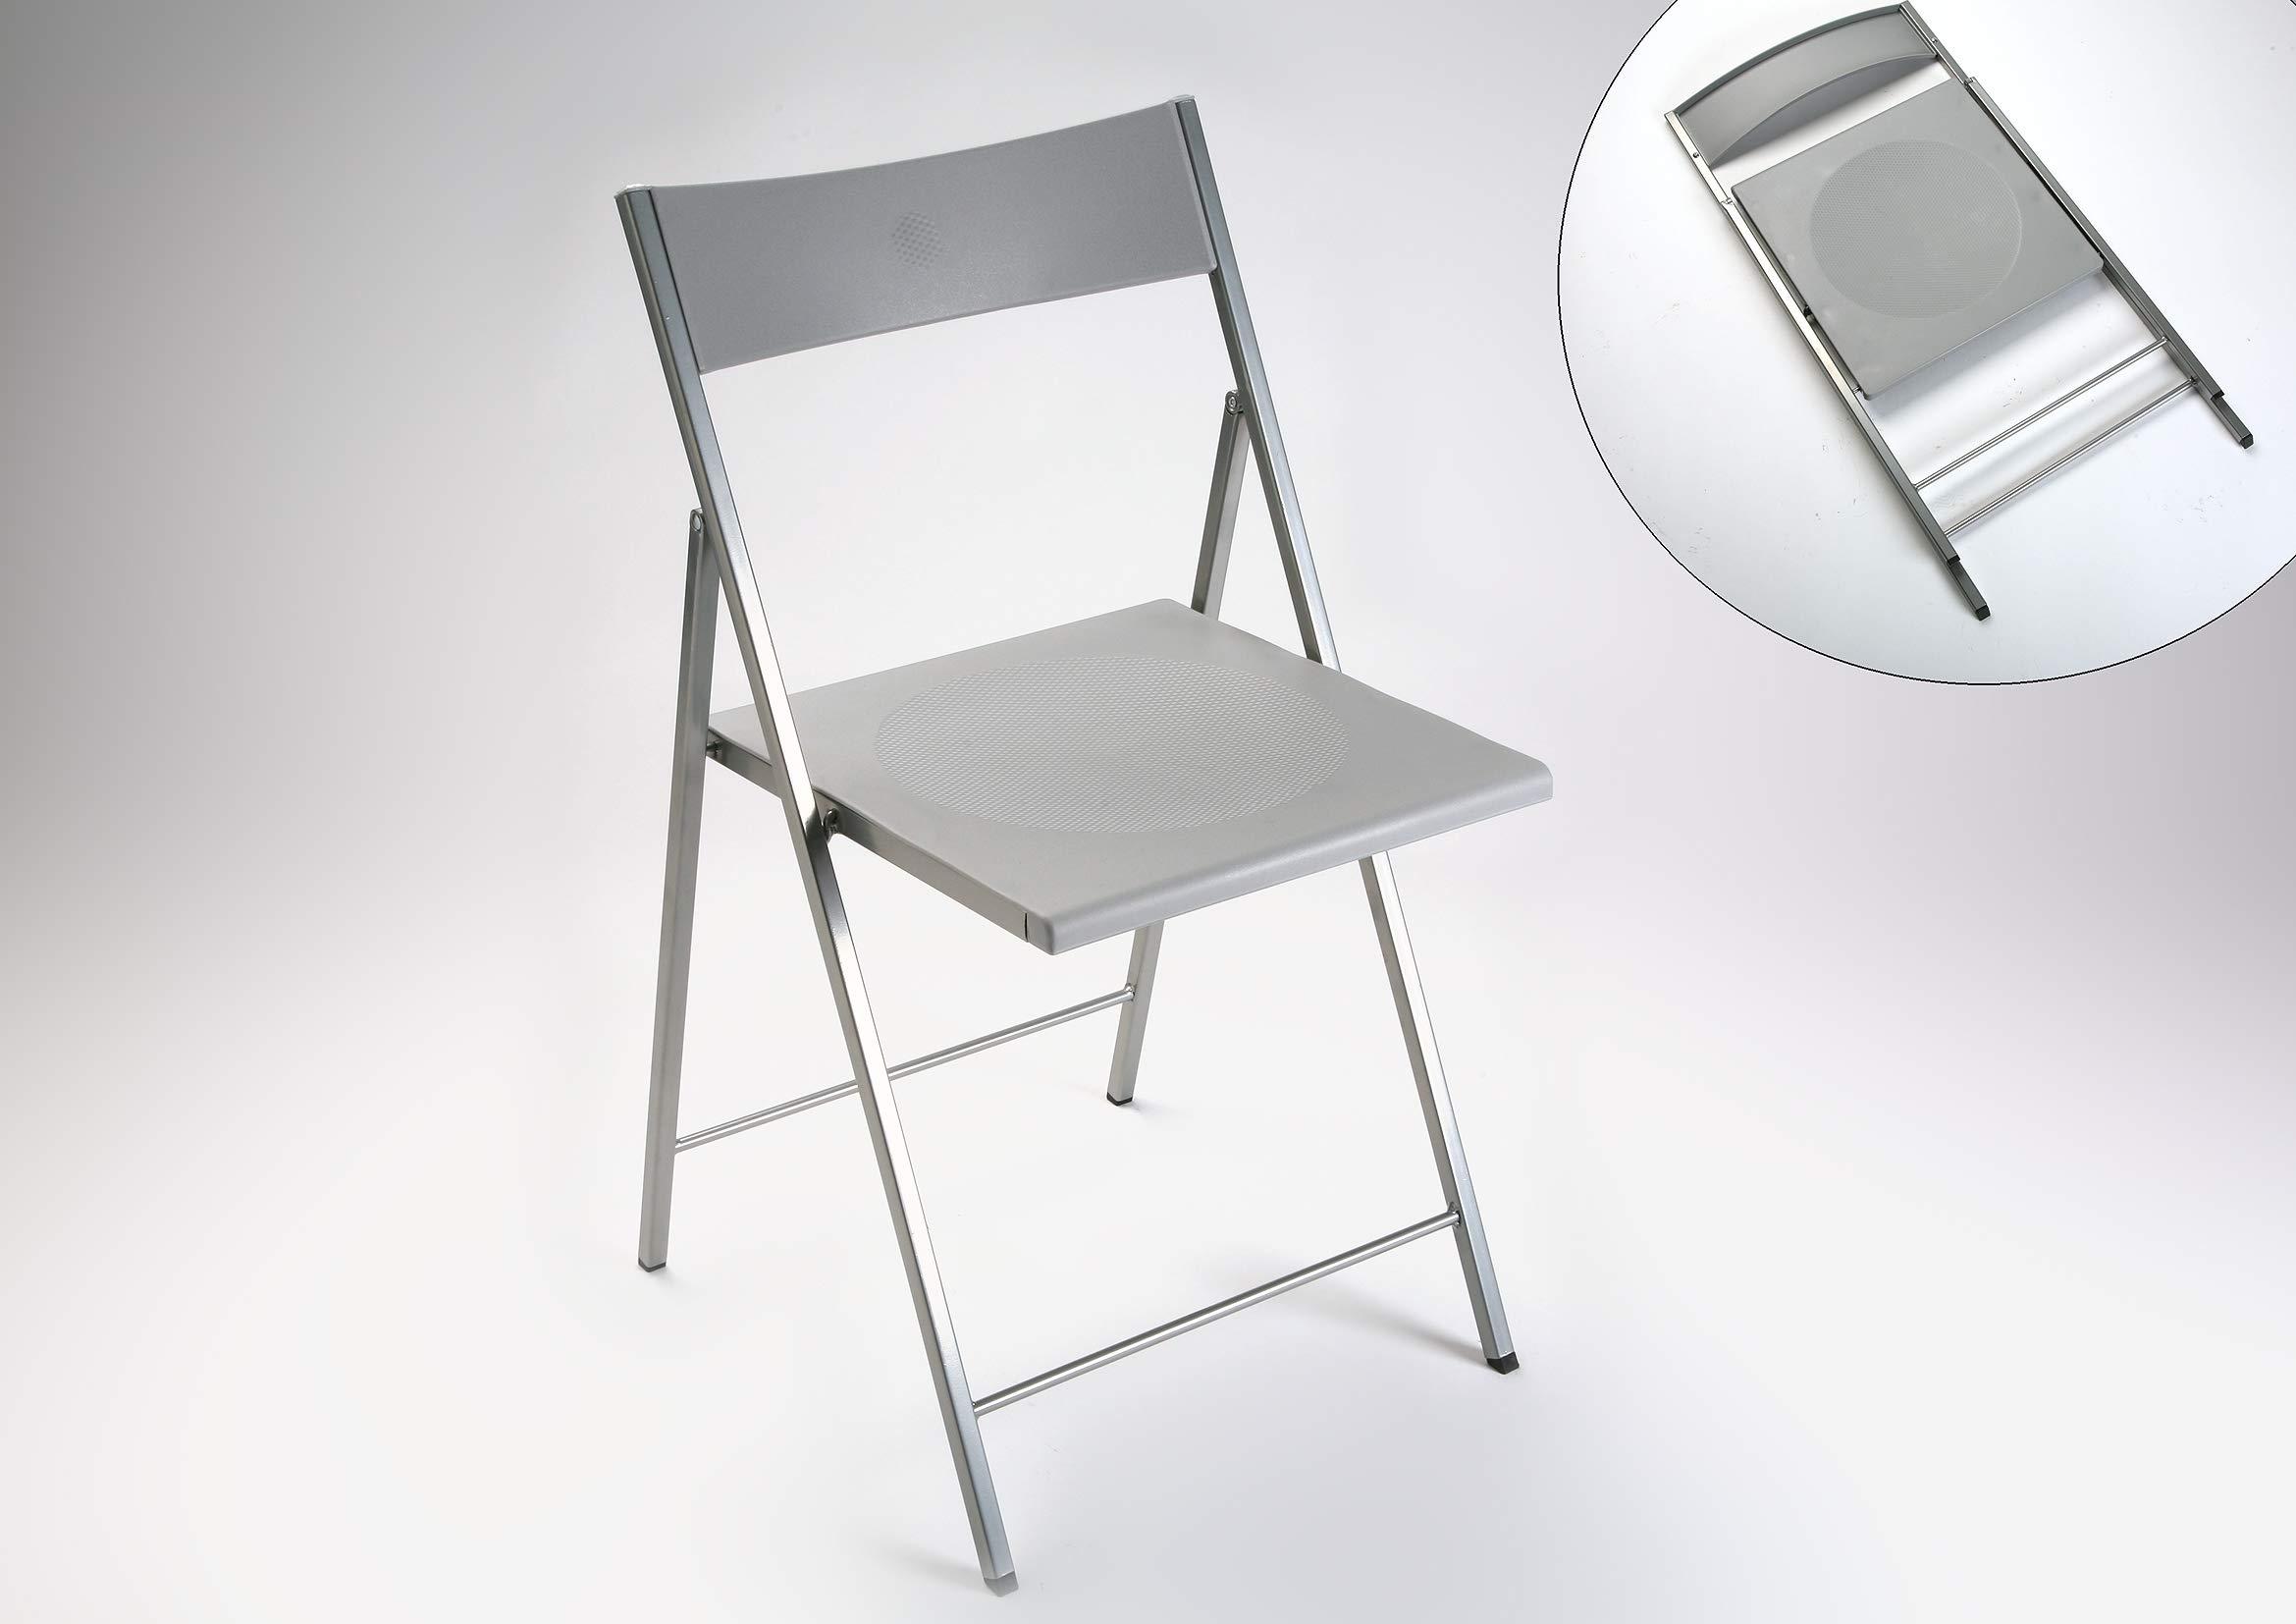 Versa - Silla plegable silver belfort product image